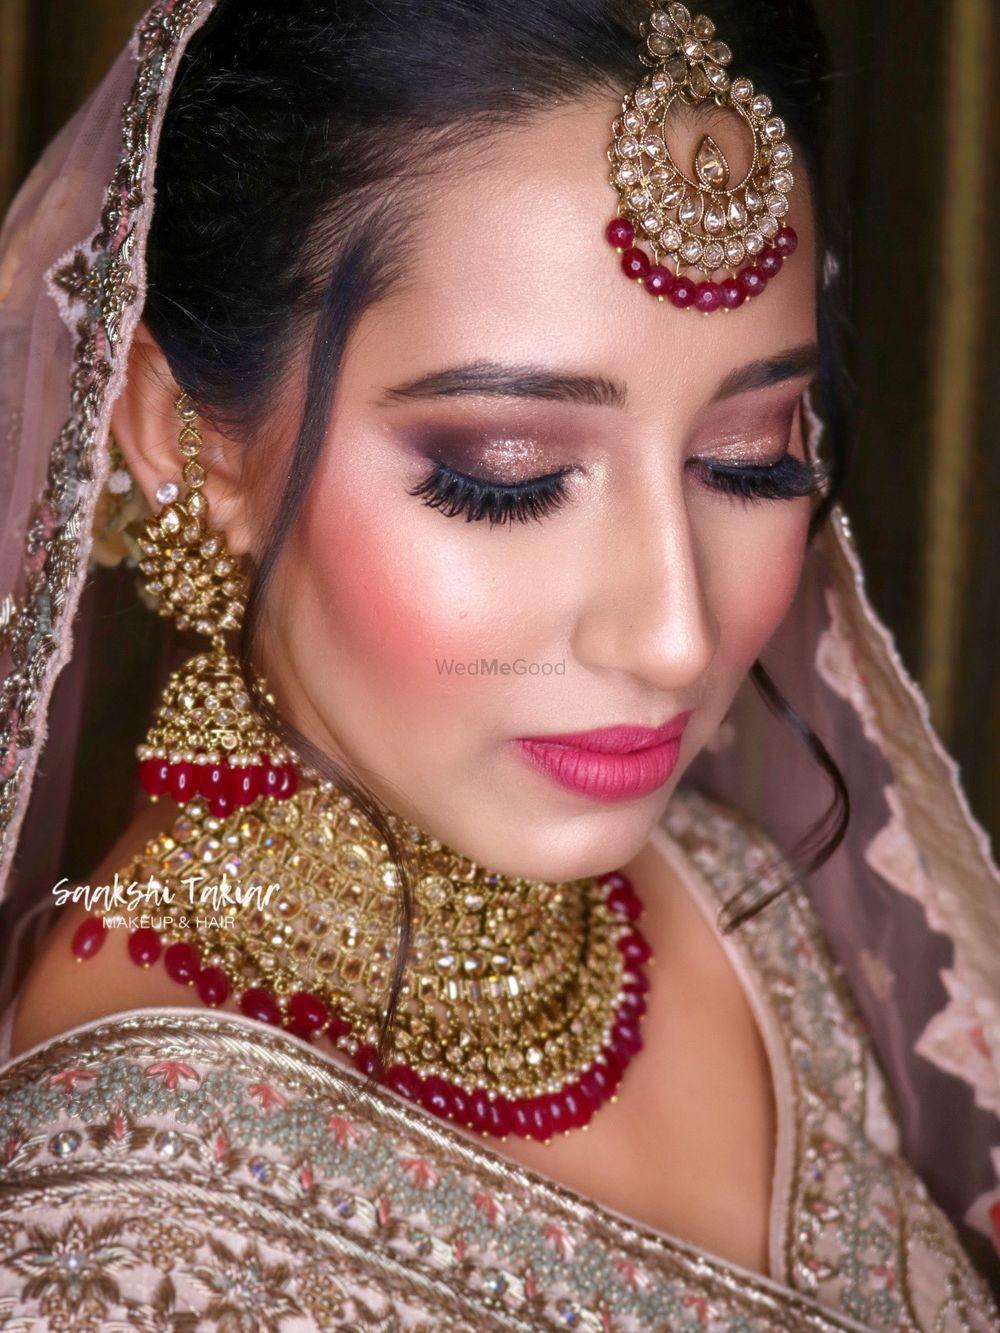 Photo By Makeup by Saakshi Takiar - Bridal Makeup